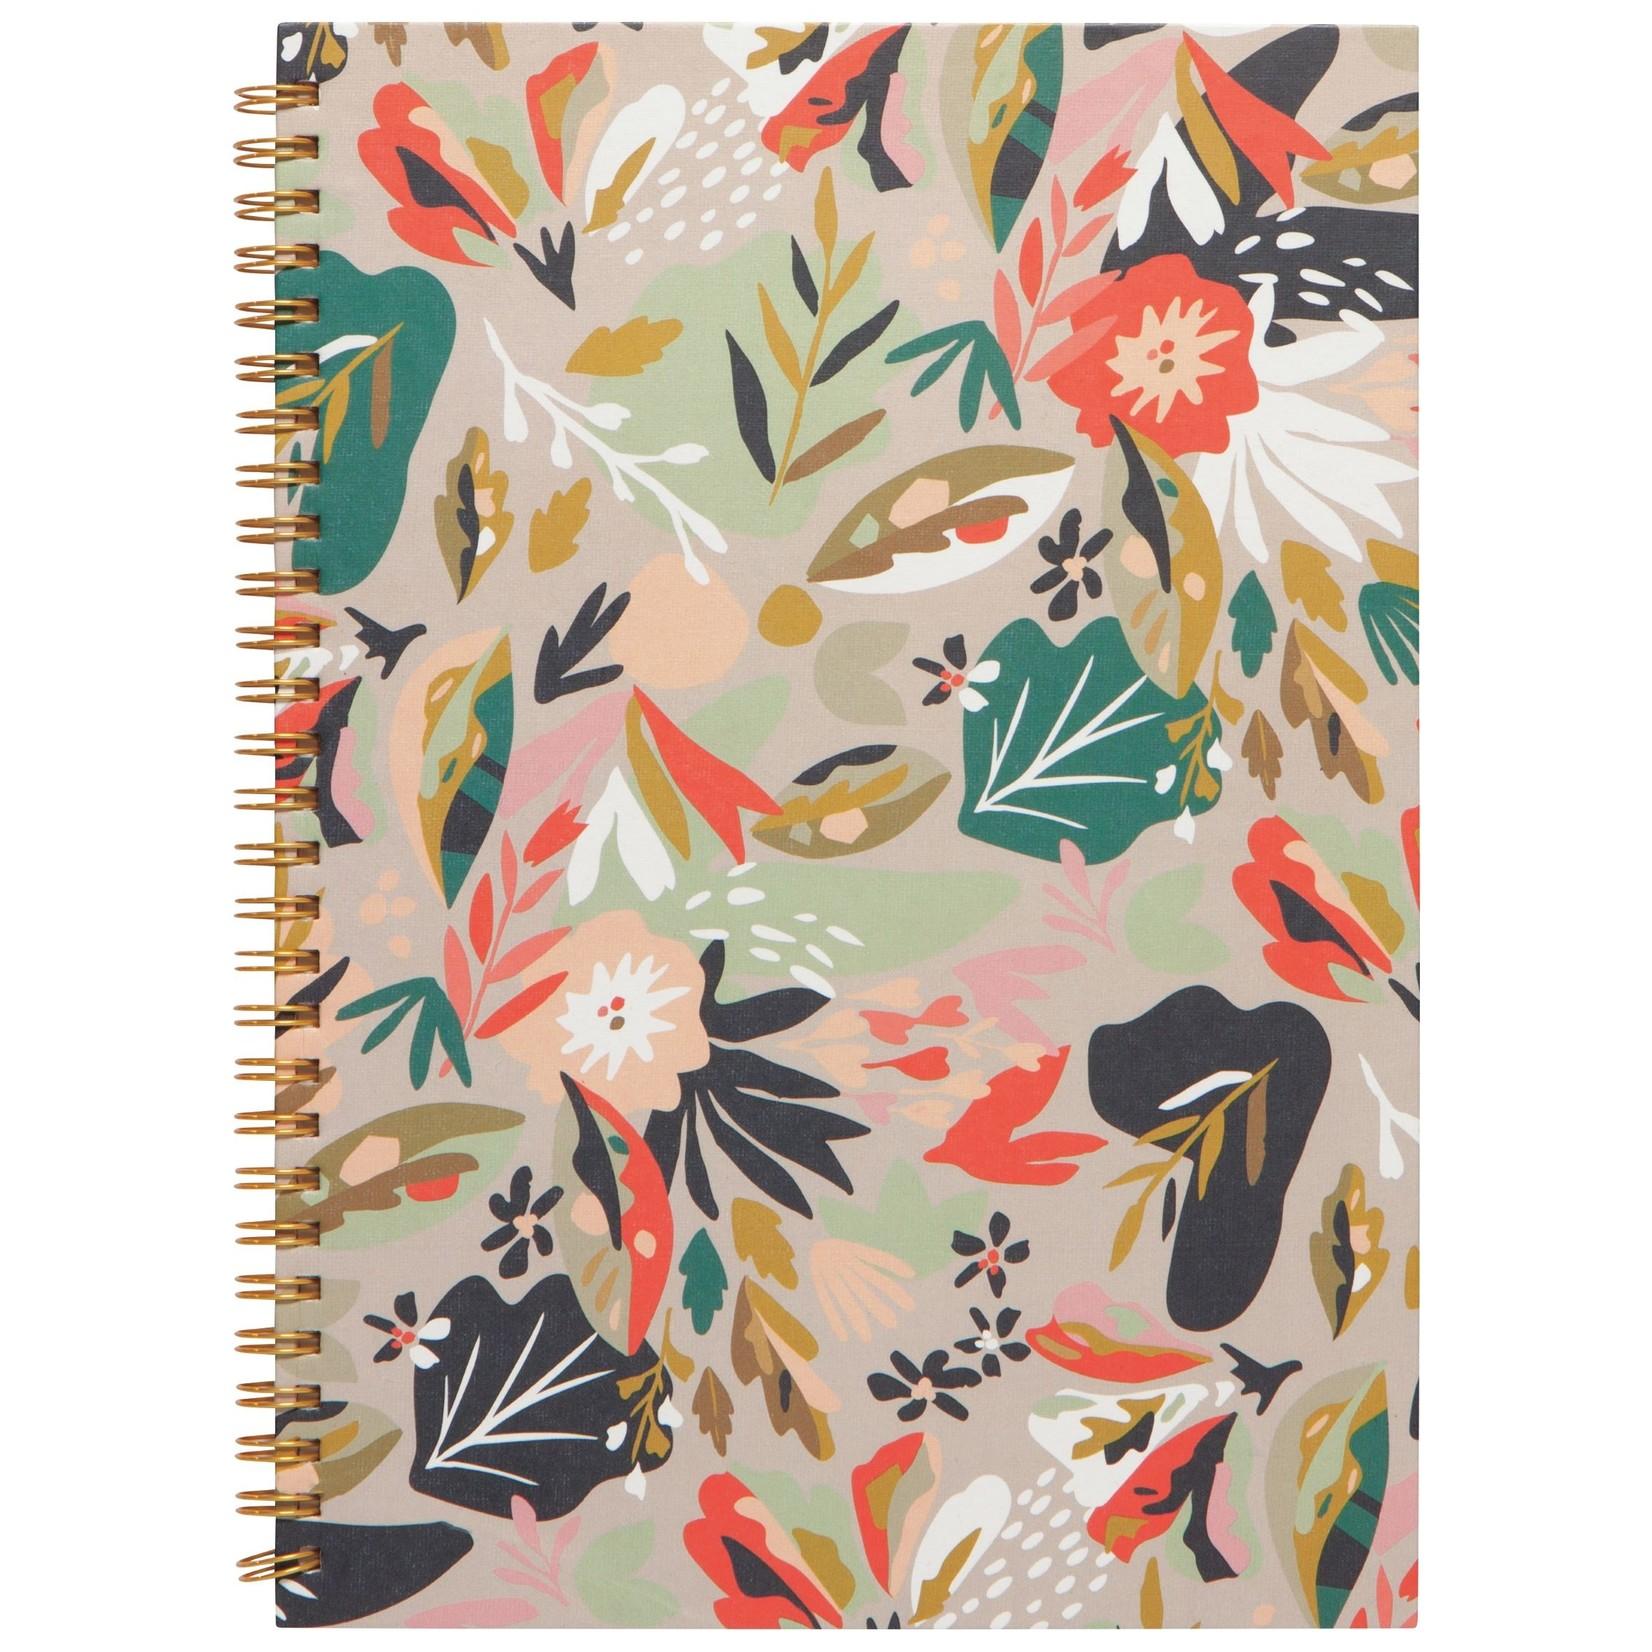 Danica Studio Superbloom Ring Bound Notebook